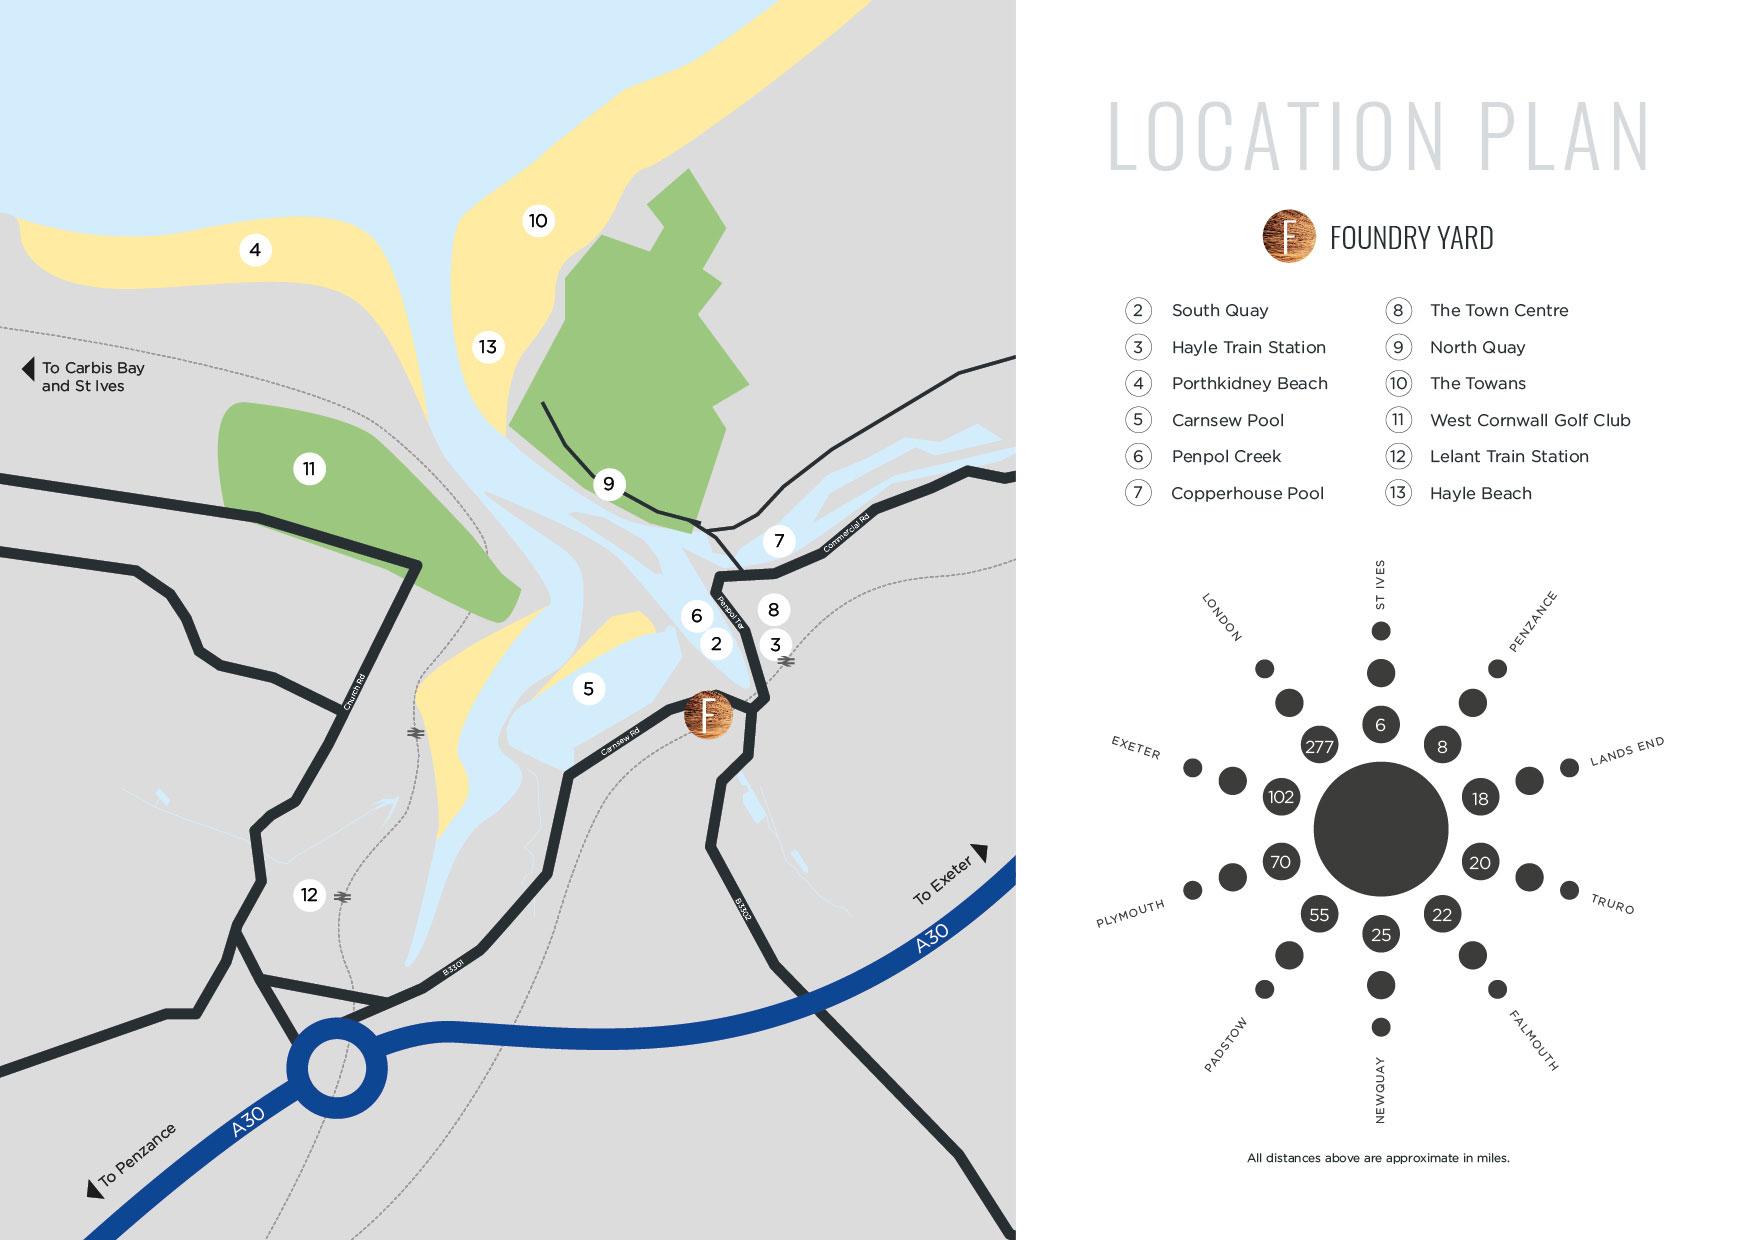 Foundry Yard New Homes Development - Site Location